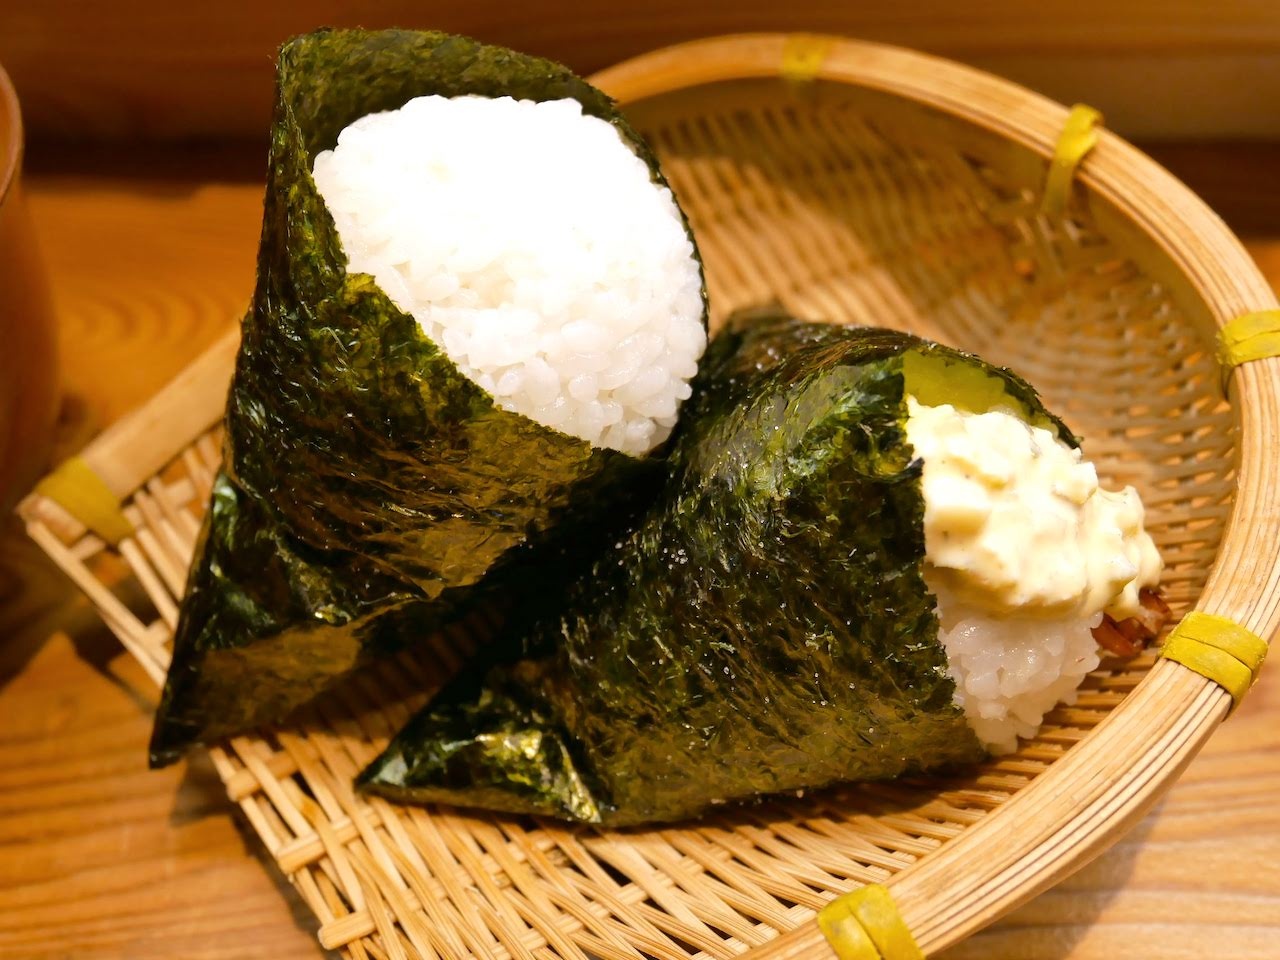 http://morning.tokyo-review.com/images/1150926.jpg